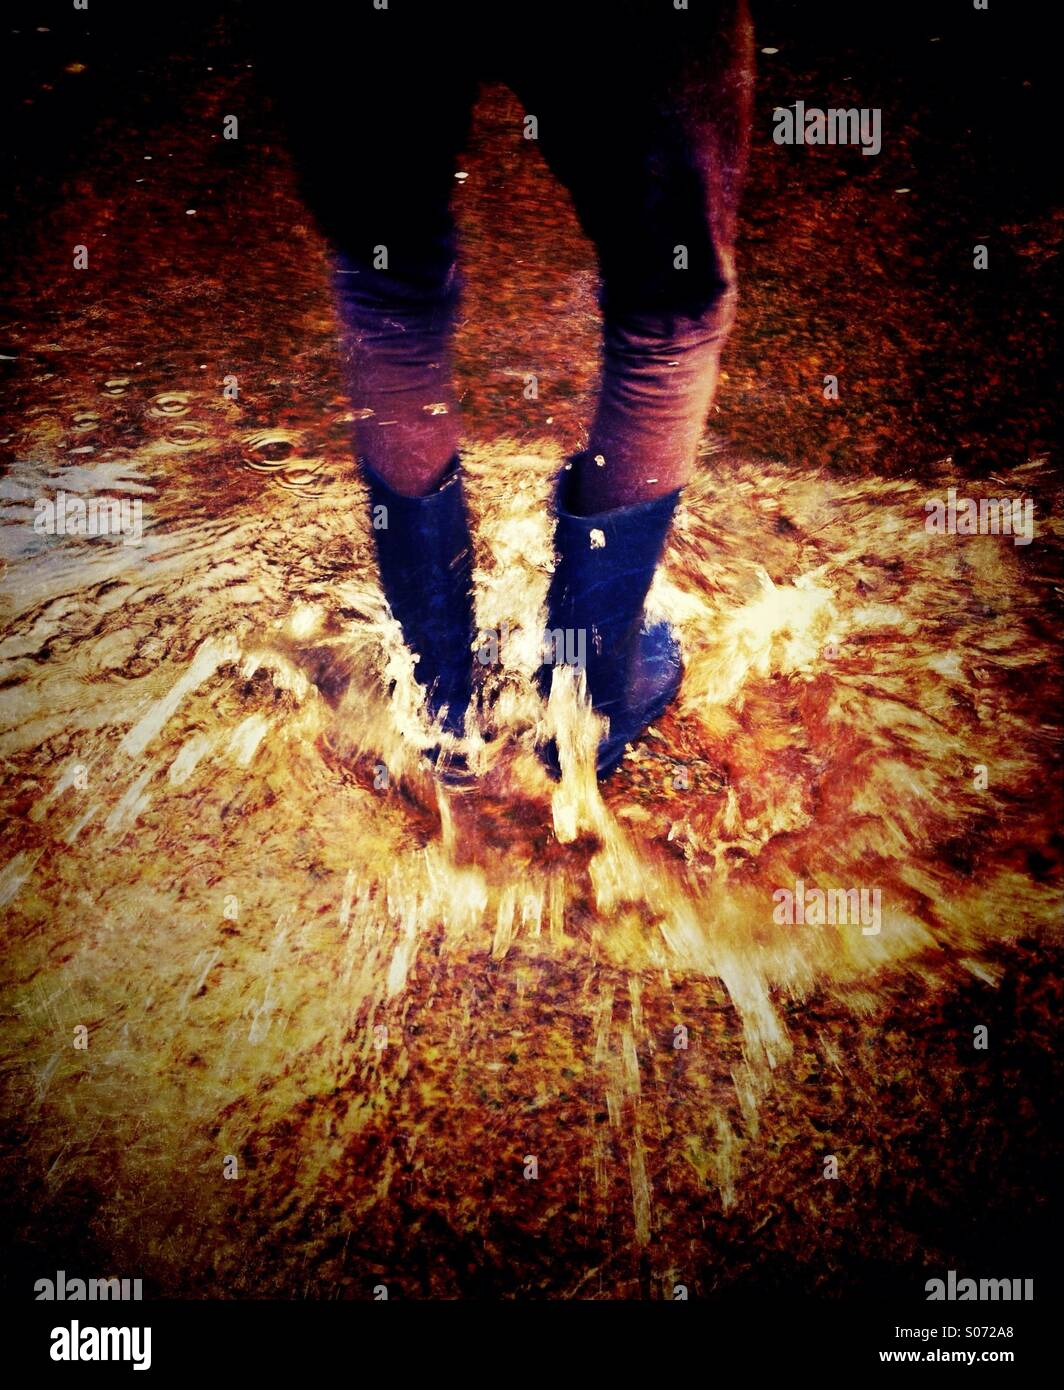 Young girl splashing in stream - Stock Image